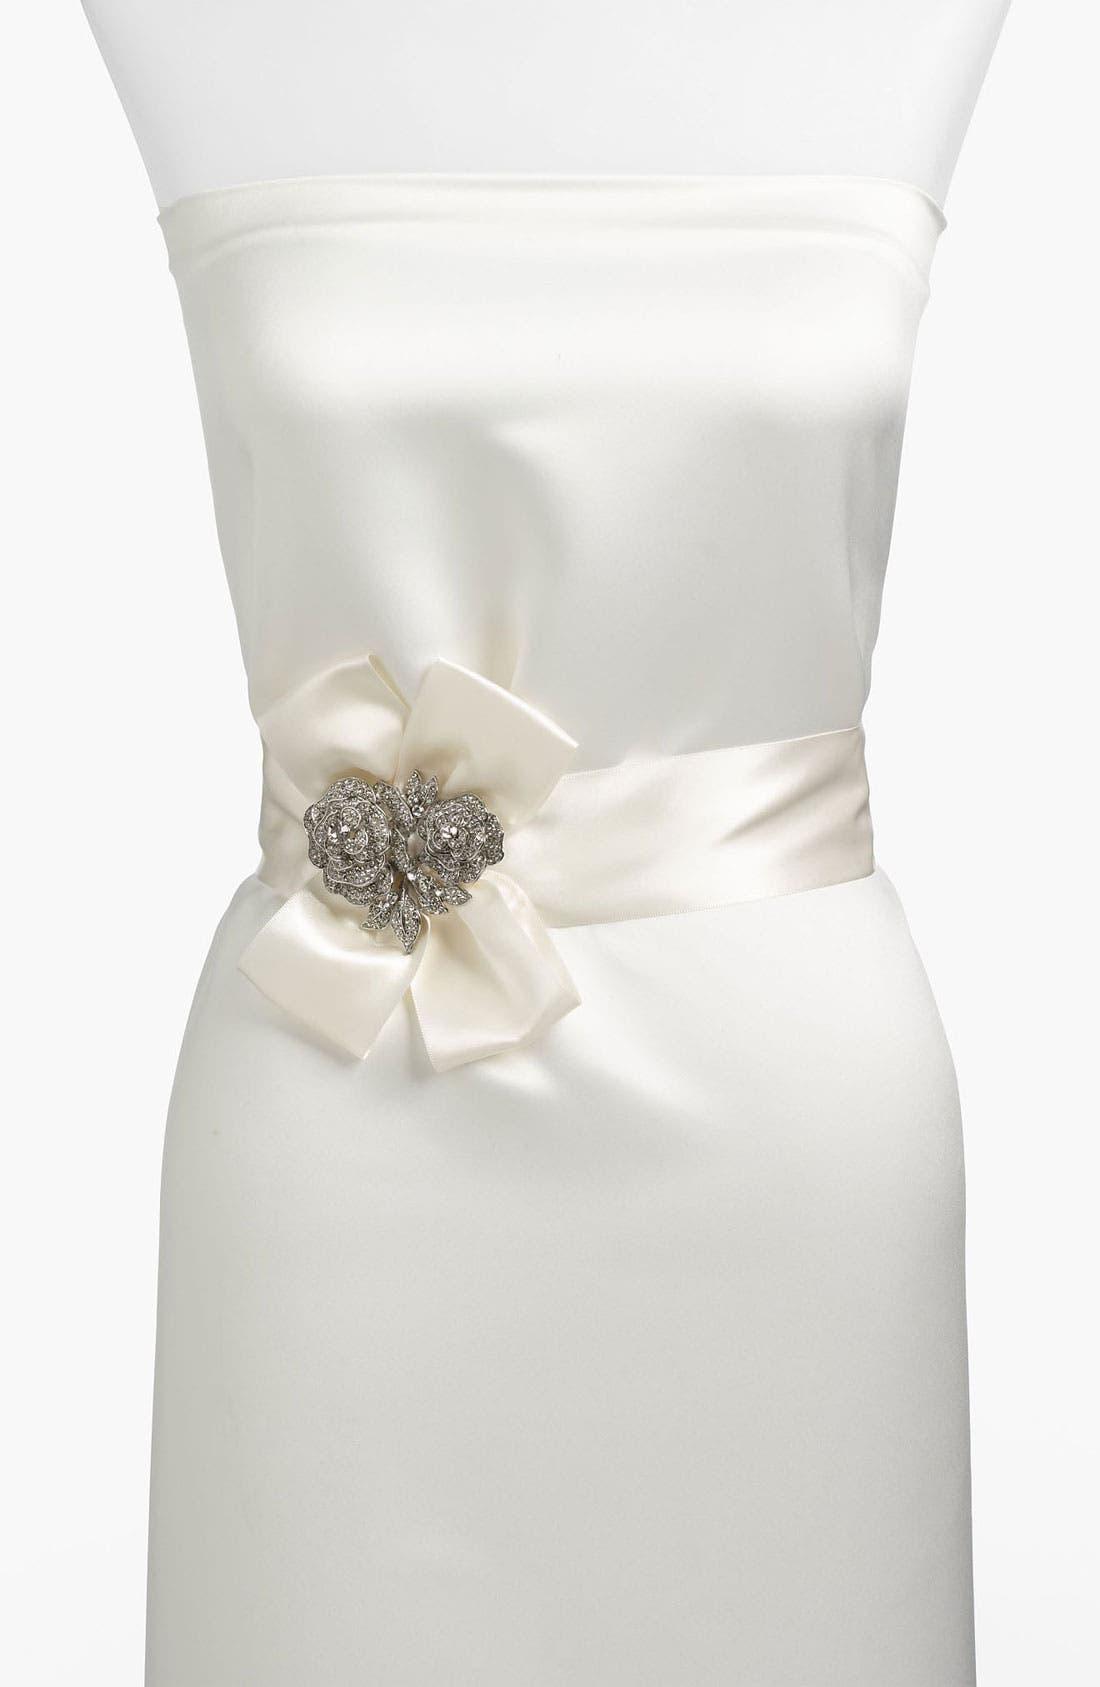 Alternate Image 1 Selected - Nina Satin Crystal Flower Sash